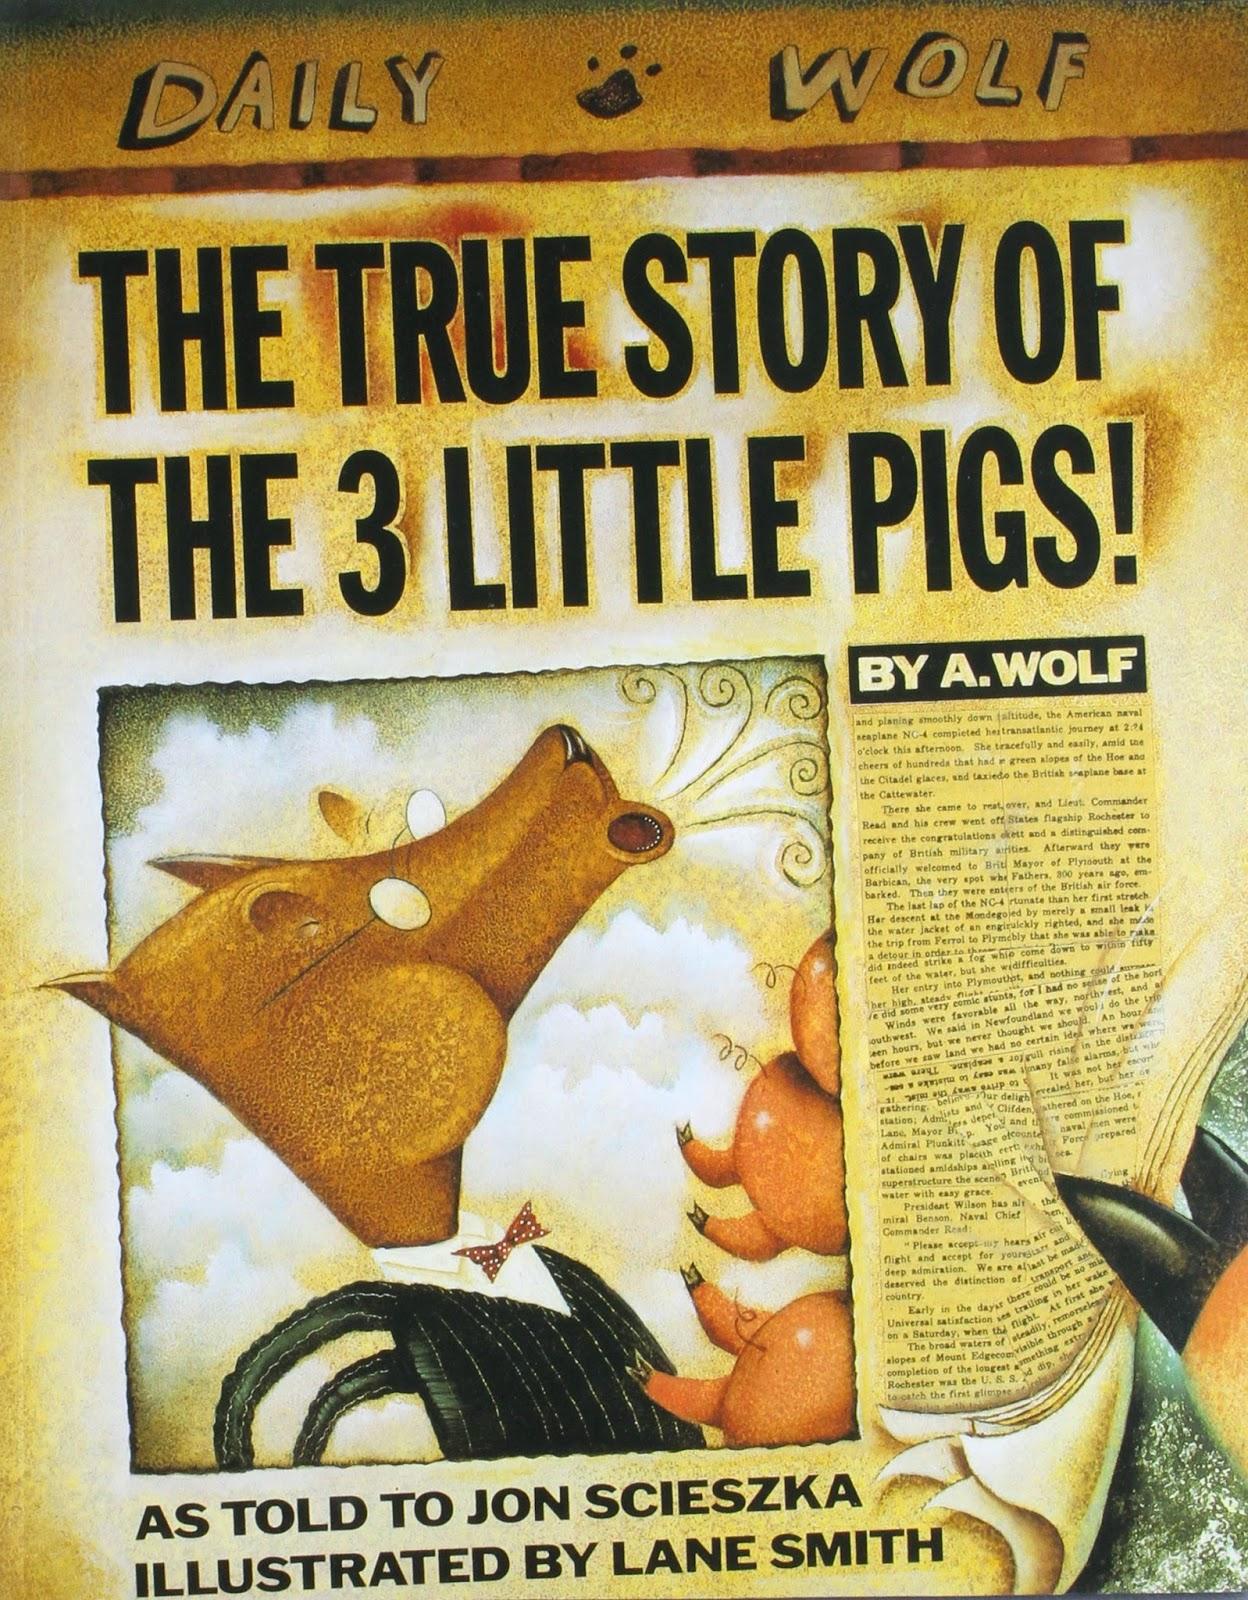 http://www.amazon.com/True-Story-Three-Little-Pigs/dp/0140544518/ref=sr_1_1?ie=UTF8&qid=1422377713&sr=8-1&keywords=true+story+of+three+little+pigs